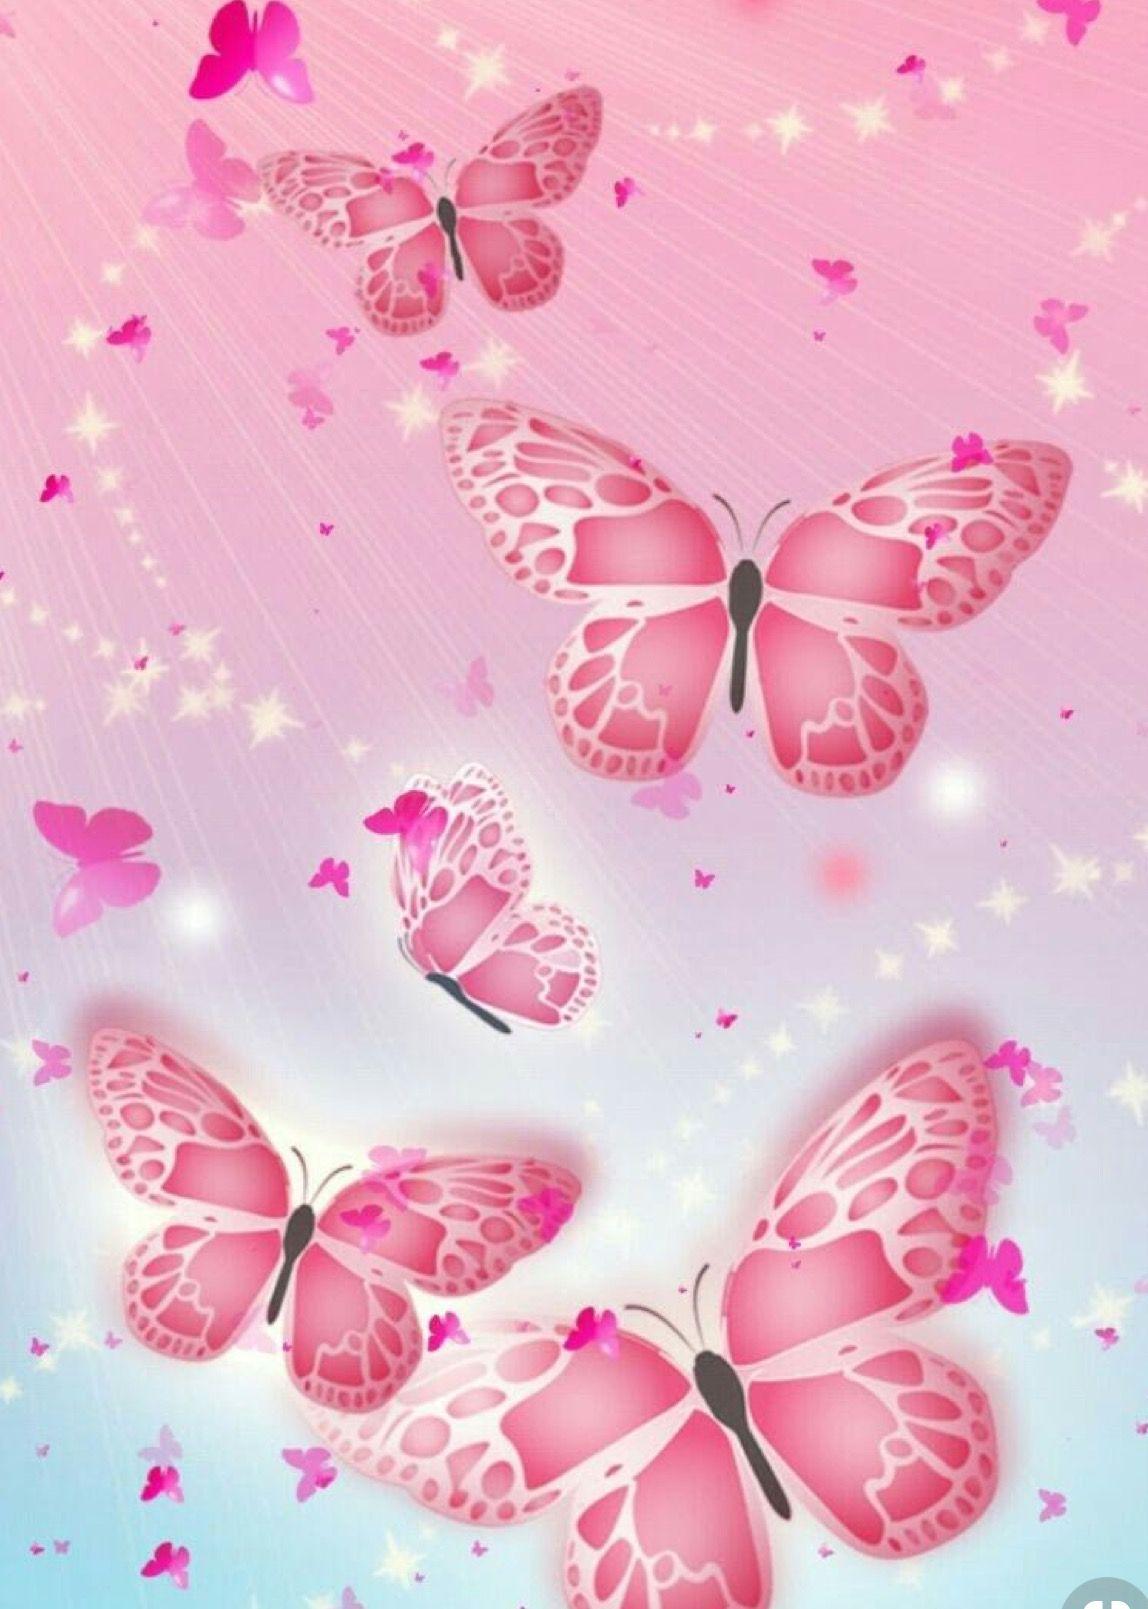 Pin By Traci Jervas On I Like 3 Pinky Wallpaper Butterfly Art Owl Wallpaper